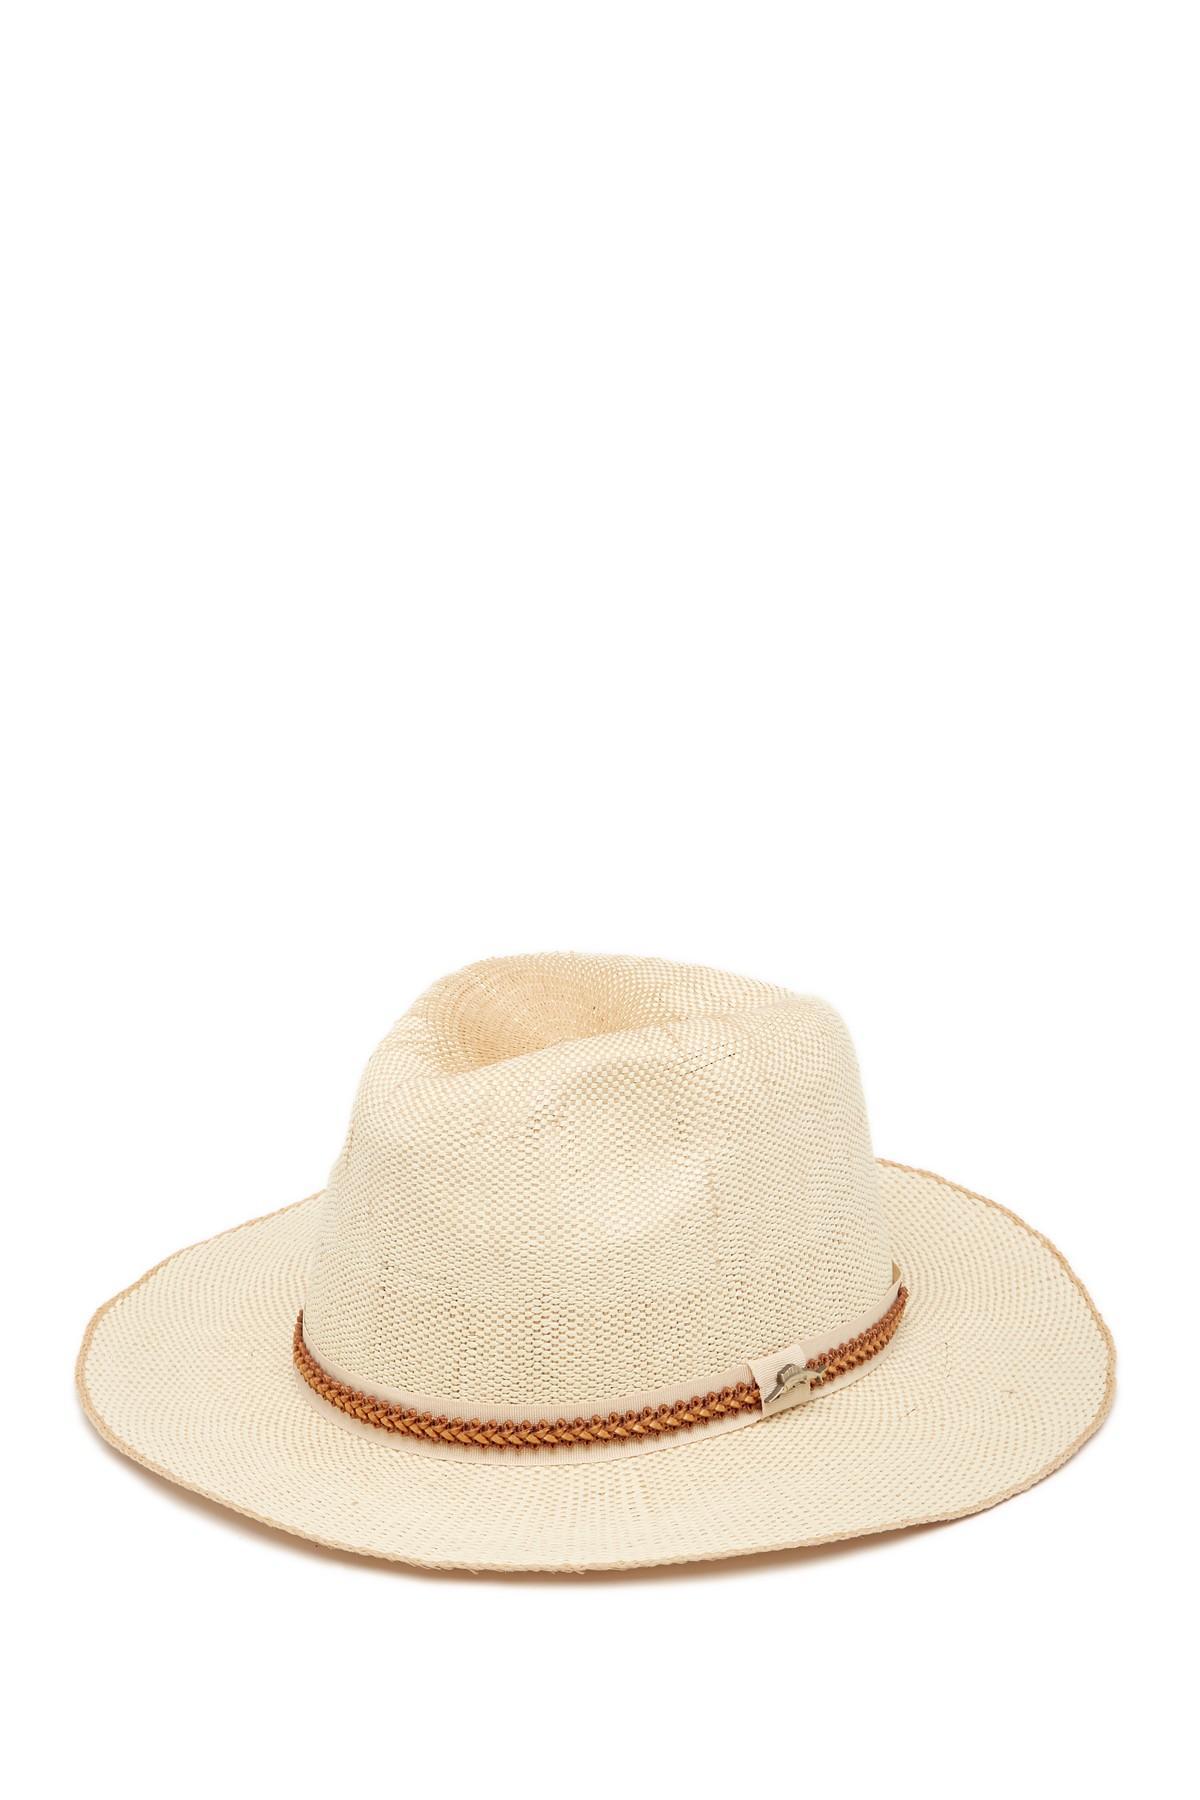 ecbfbc376ee04 Lyst - Tommy Bahama Bangkok Toyo Safari Hat in Natural for Men